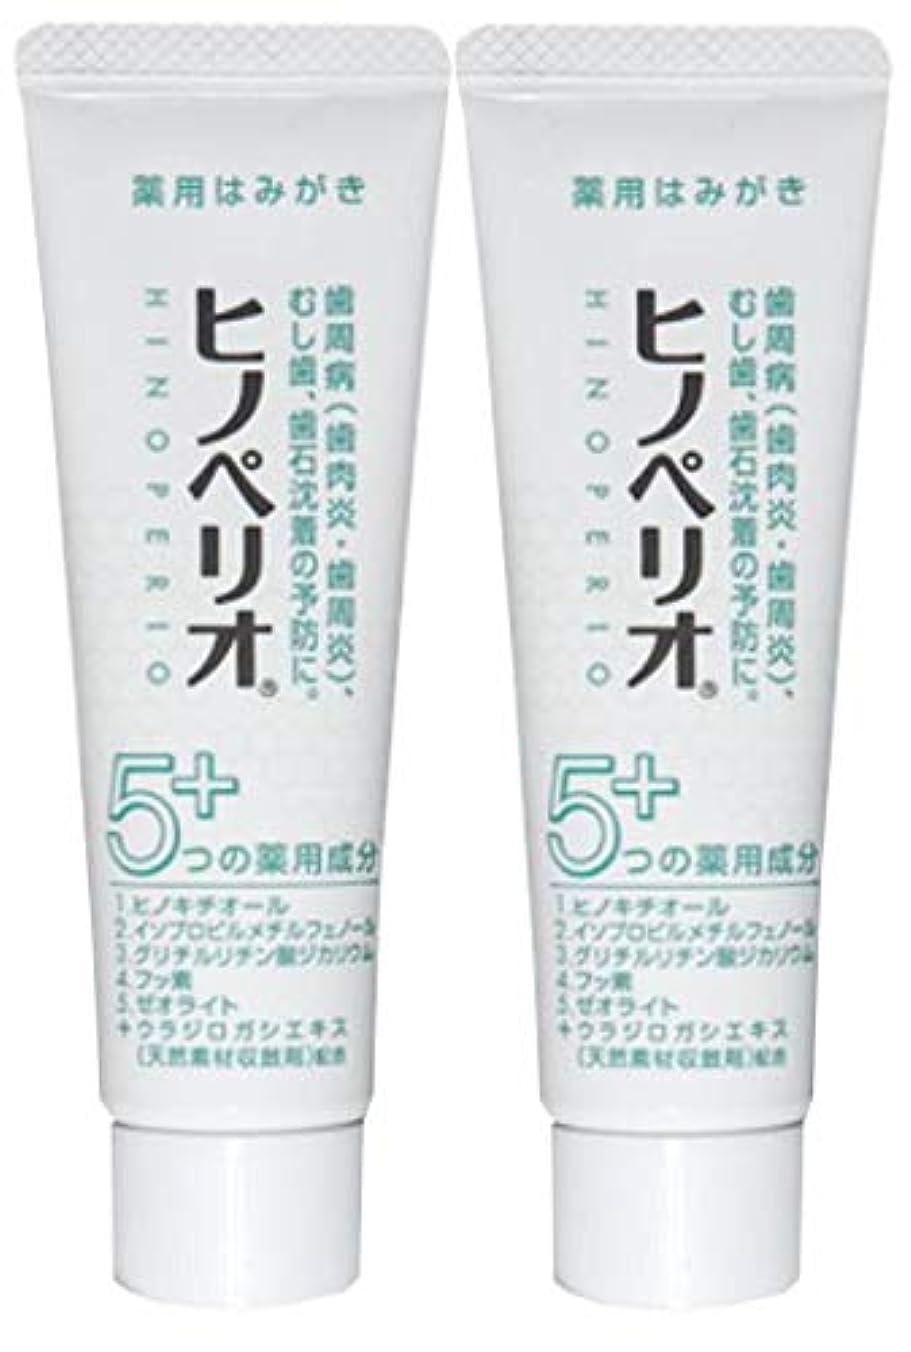 建築産地寛解昭和薬品 ヒノペリオ60g 医薬部外品 × 2本